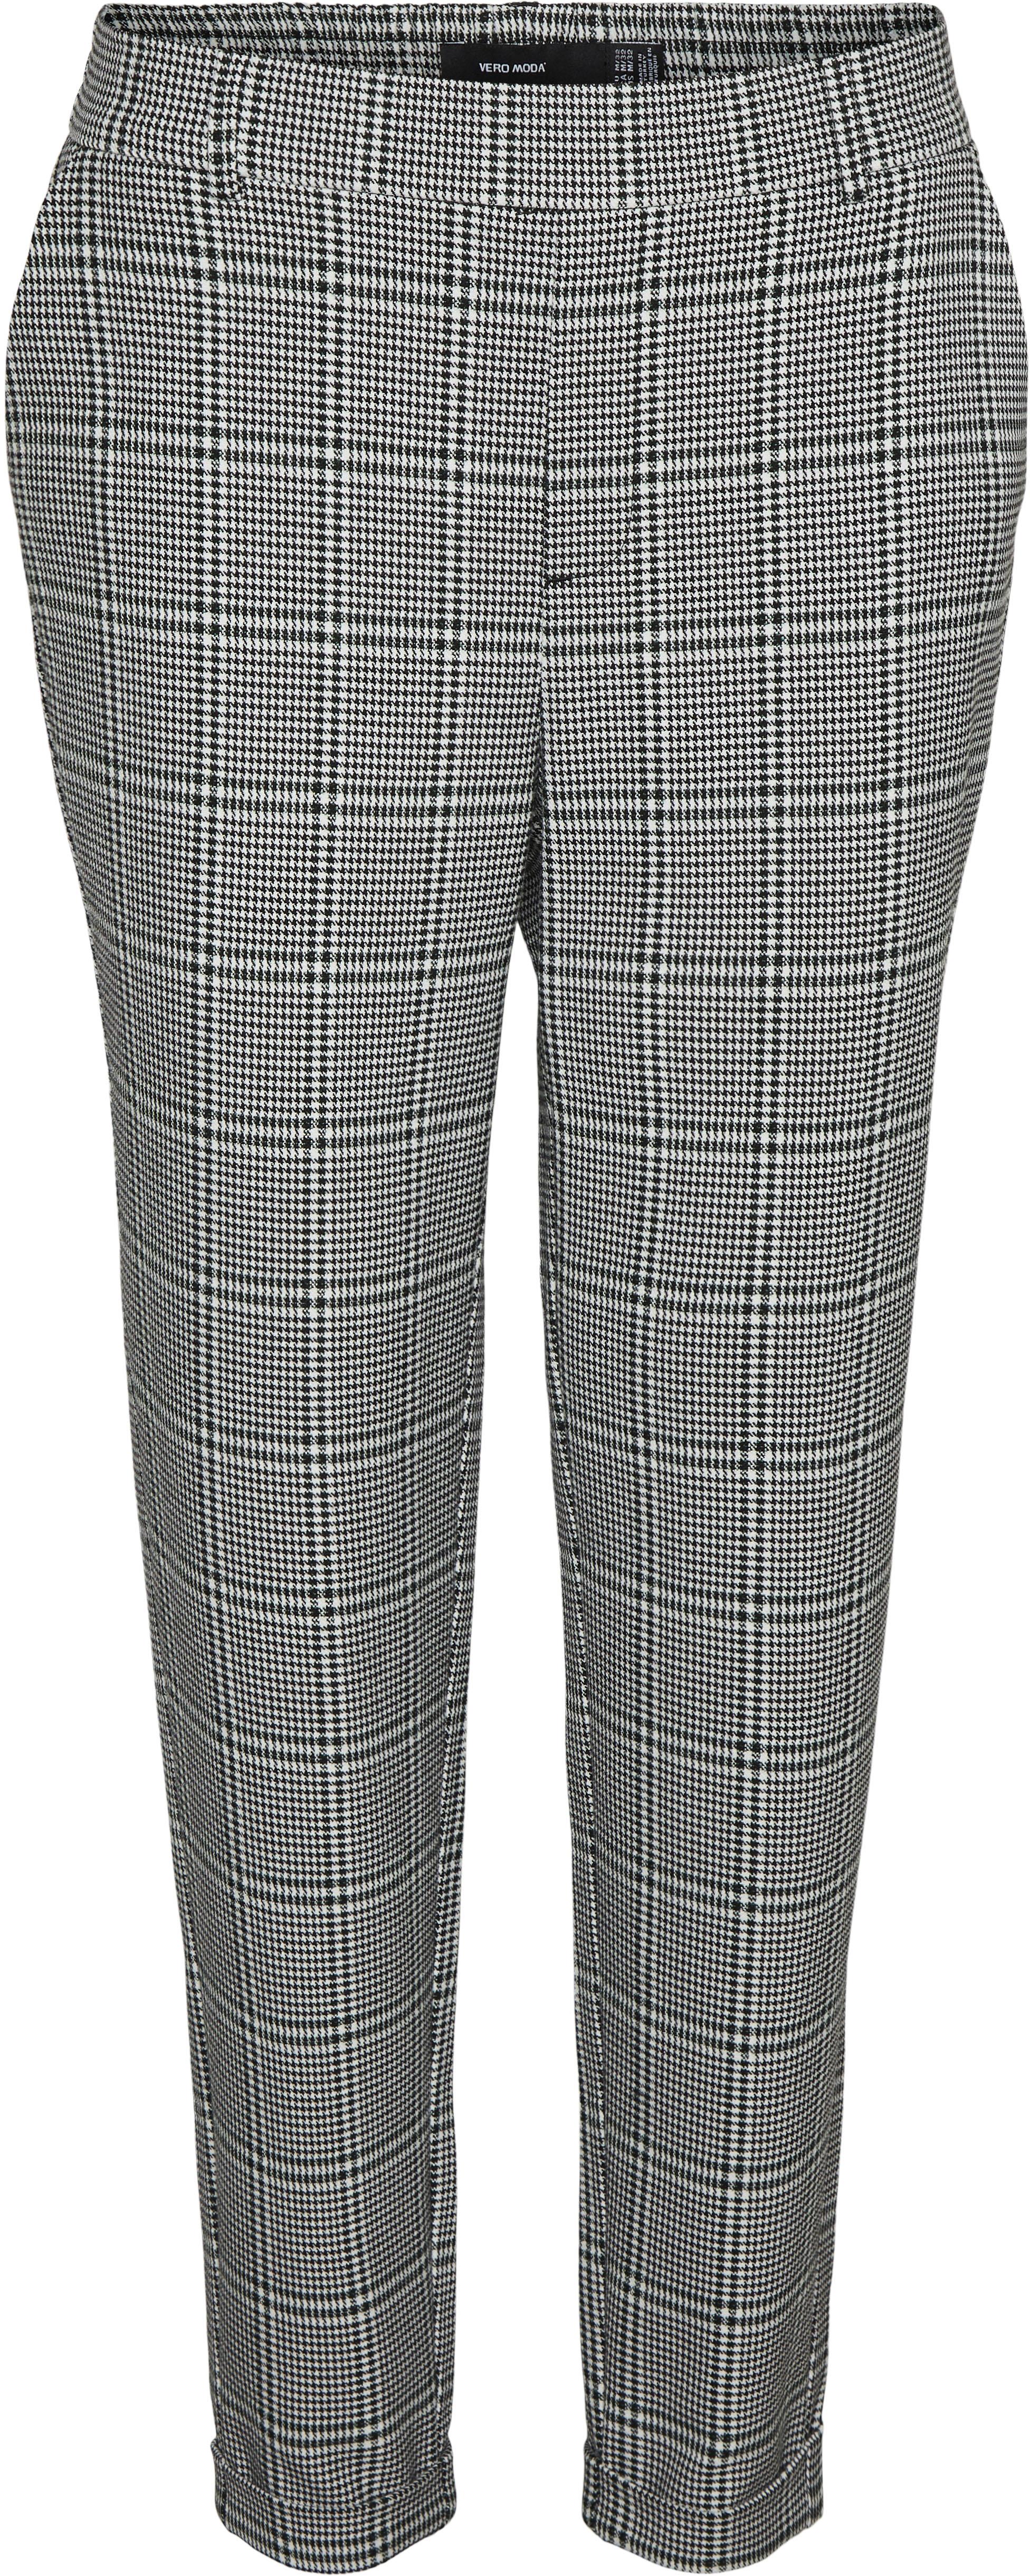 vero moda -  Anzughose VMMAYA MR LOOSE KIA CHECK PANT